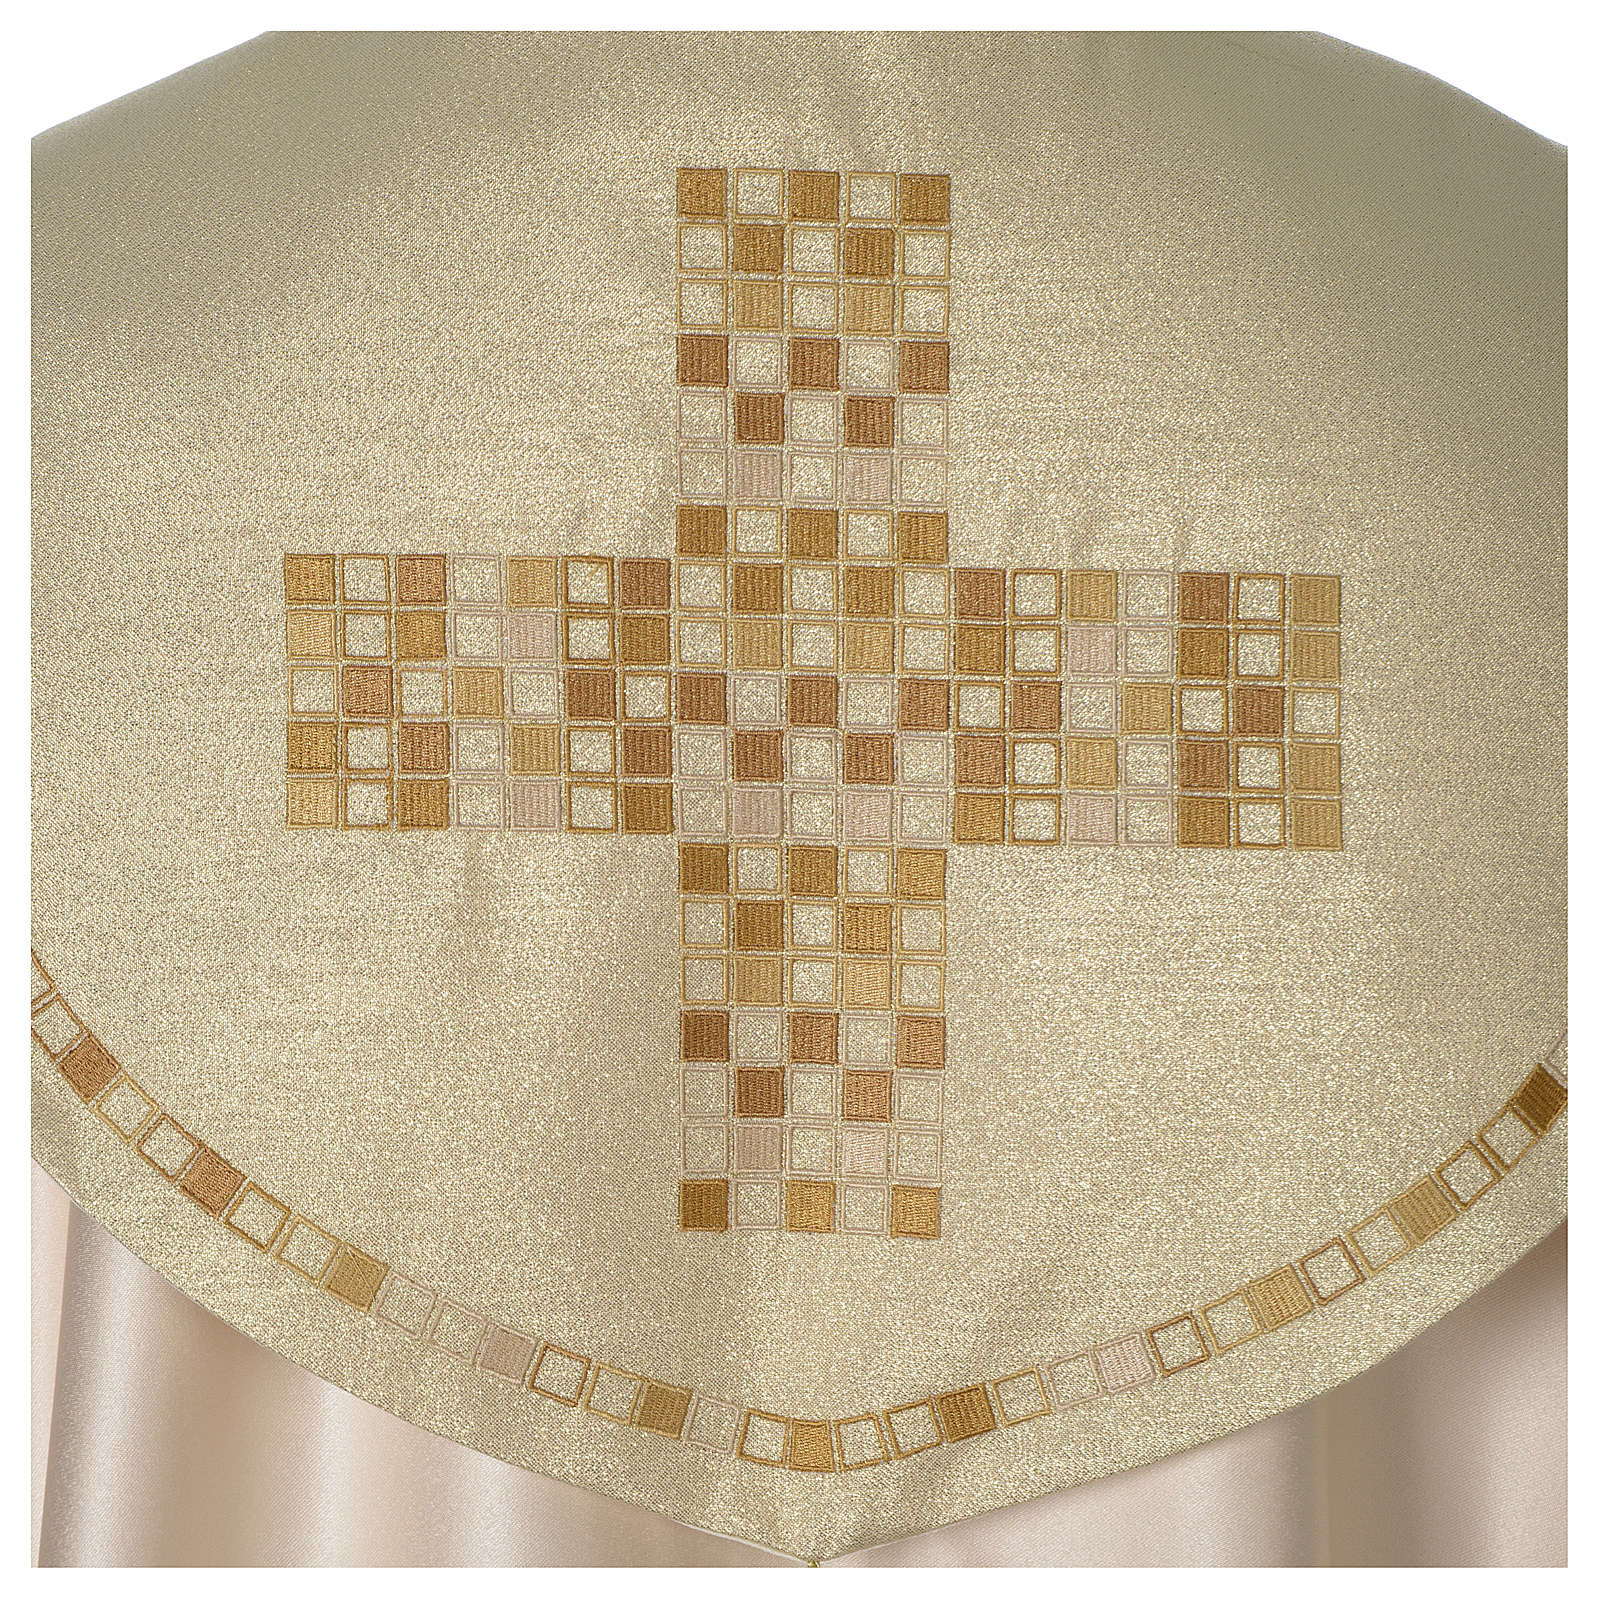 Piviale Croce moderna raso oro avorio 4